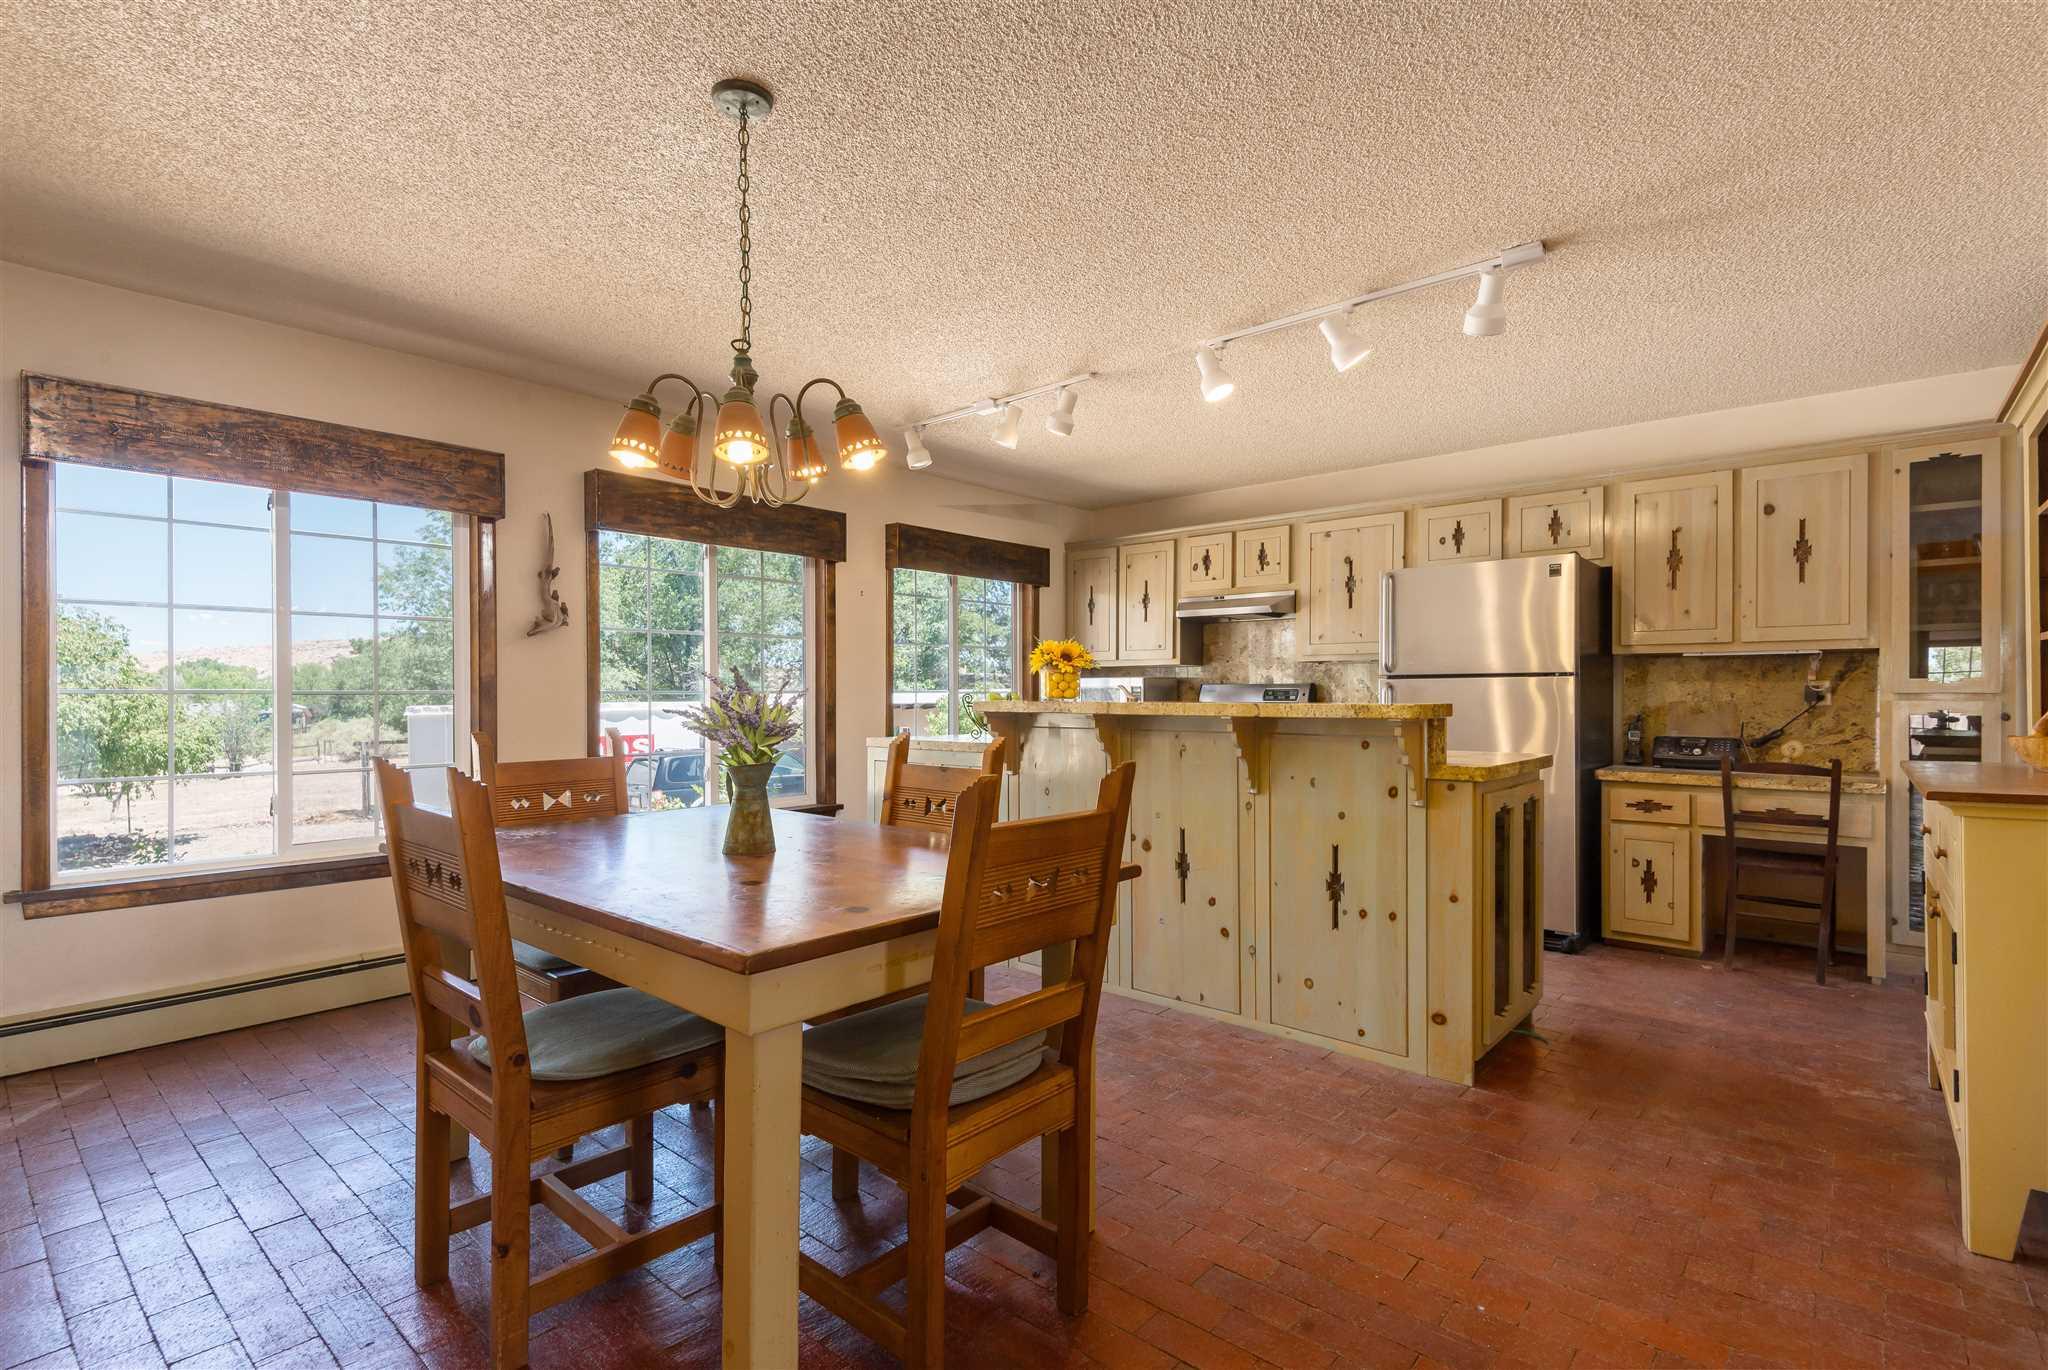 11 PASEO PATRON, Santa Fe, New Mexico 87506, 4 Bedrooms Bedrooms, ,2 BathroomsBathrooms,Single Family,For Sale,11 PASEO PATRON,1,201903273